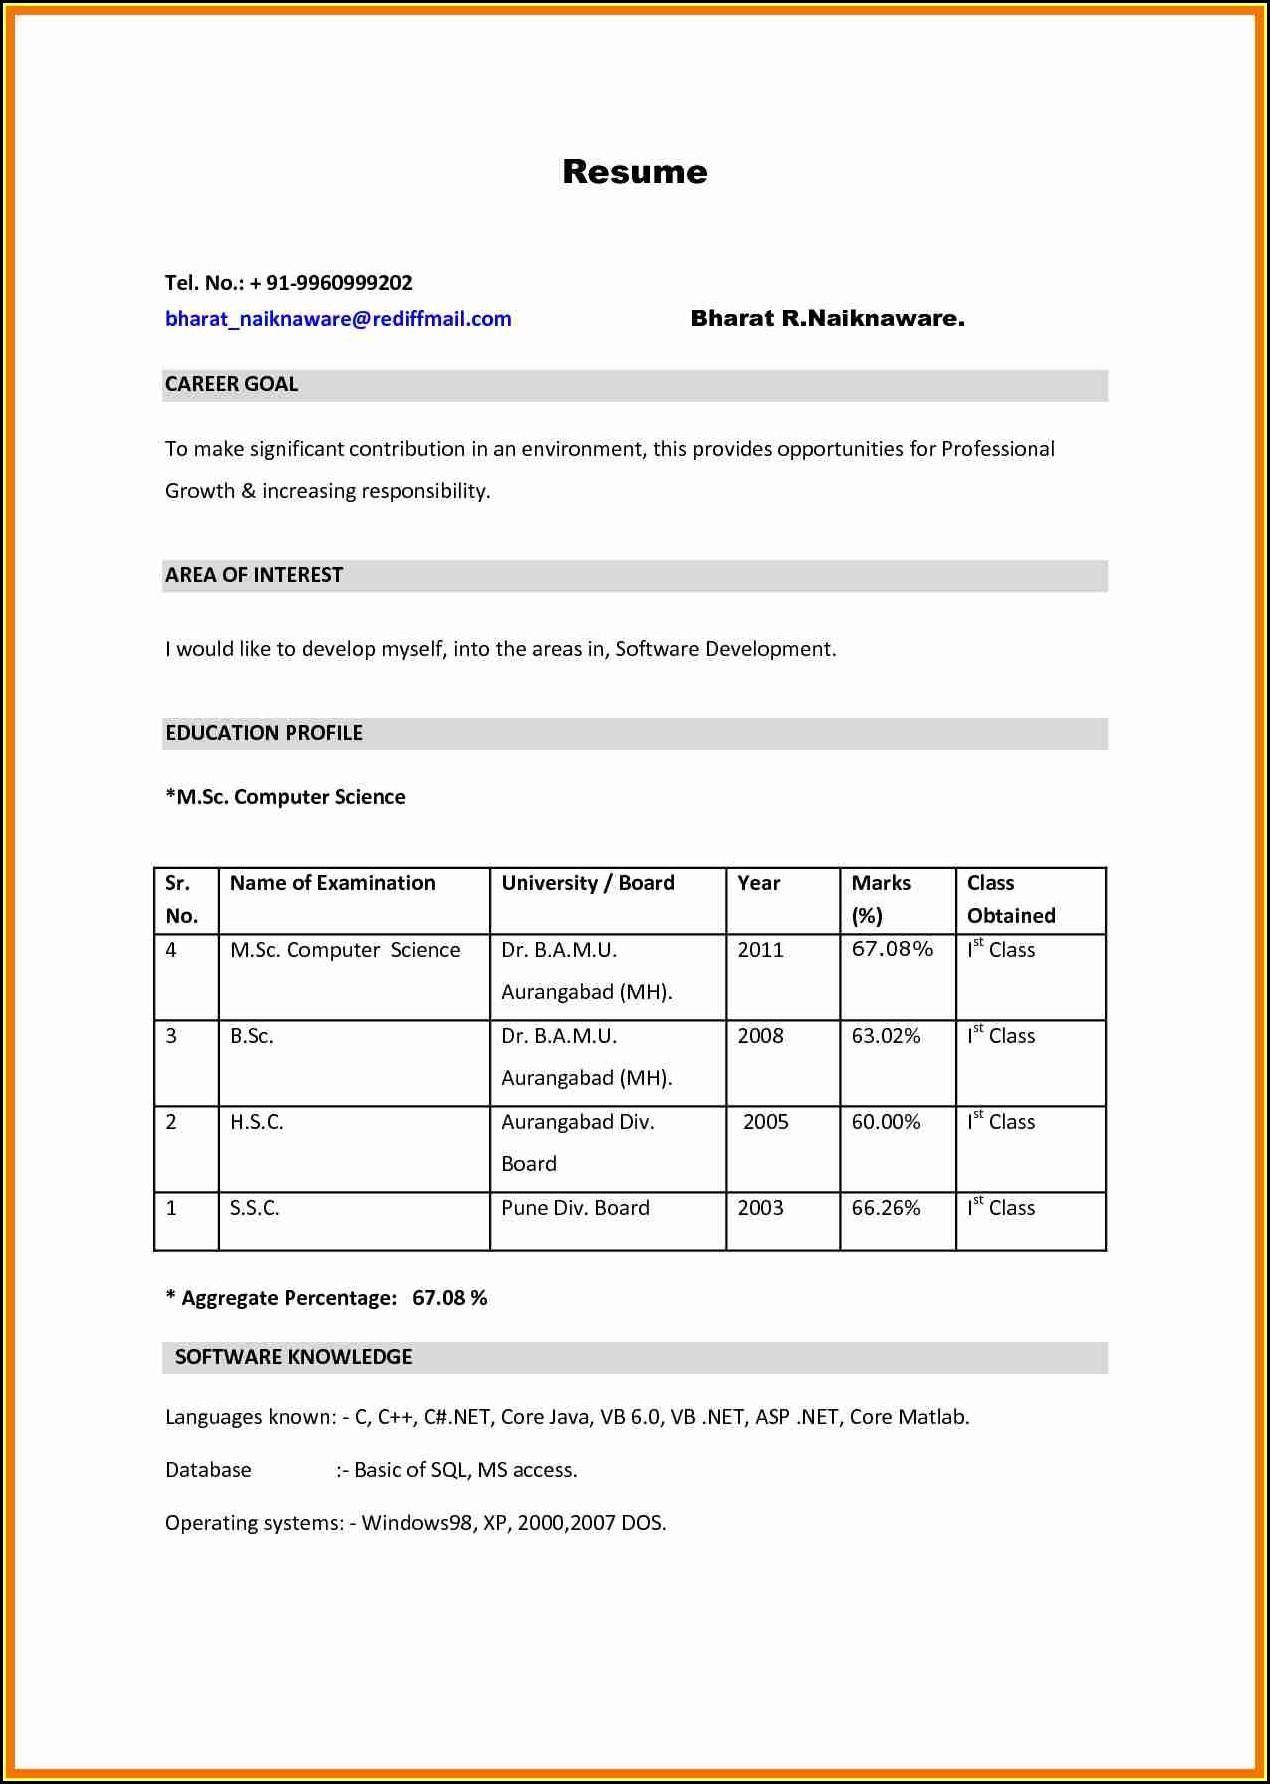 Bsc Resume Format Pdf Download - BEST RESUME EXAMPLES